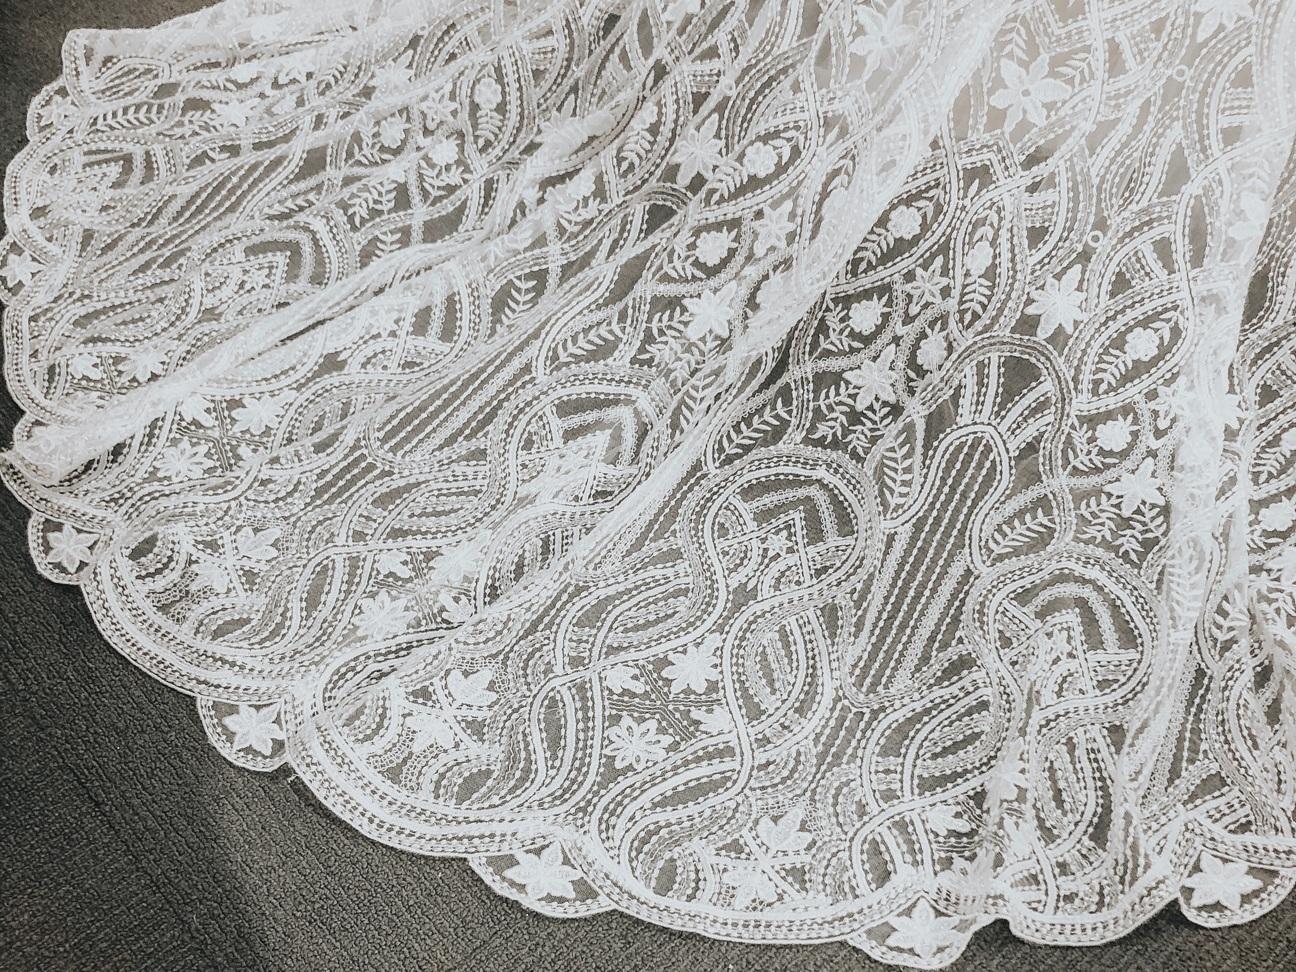 Lis-Simon-2020-Market-wedding-dress-couture-closet-train-detail.jpg